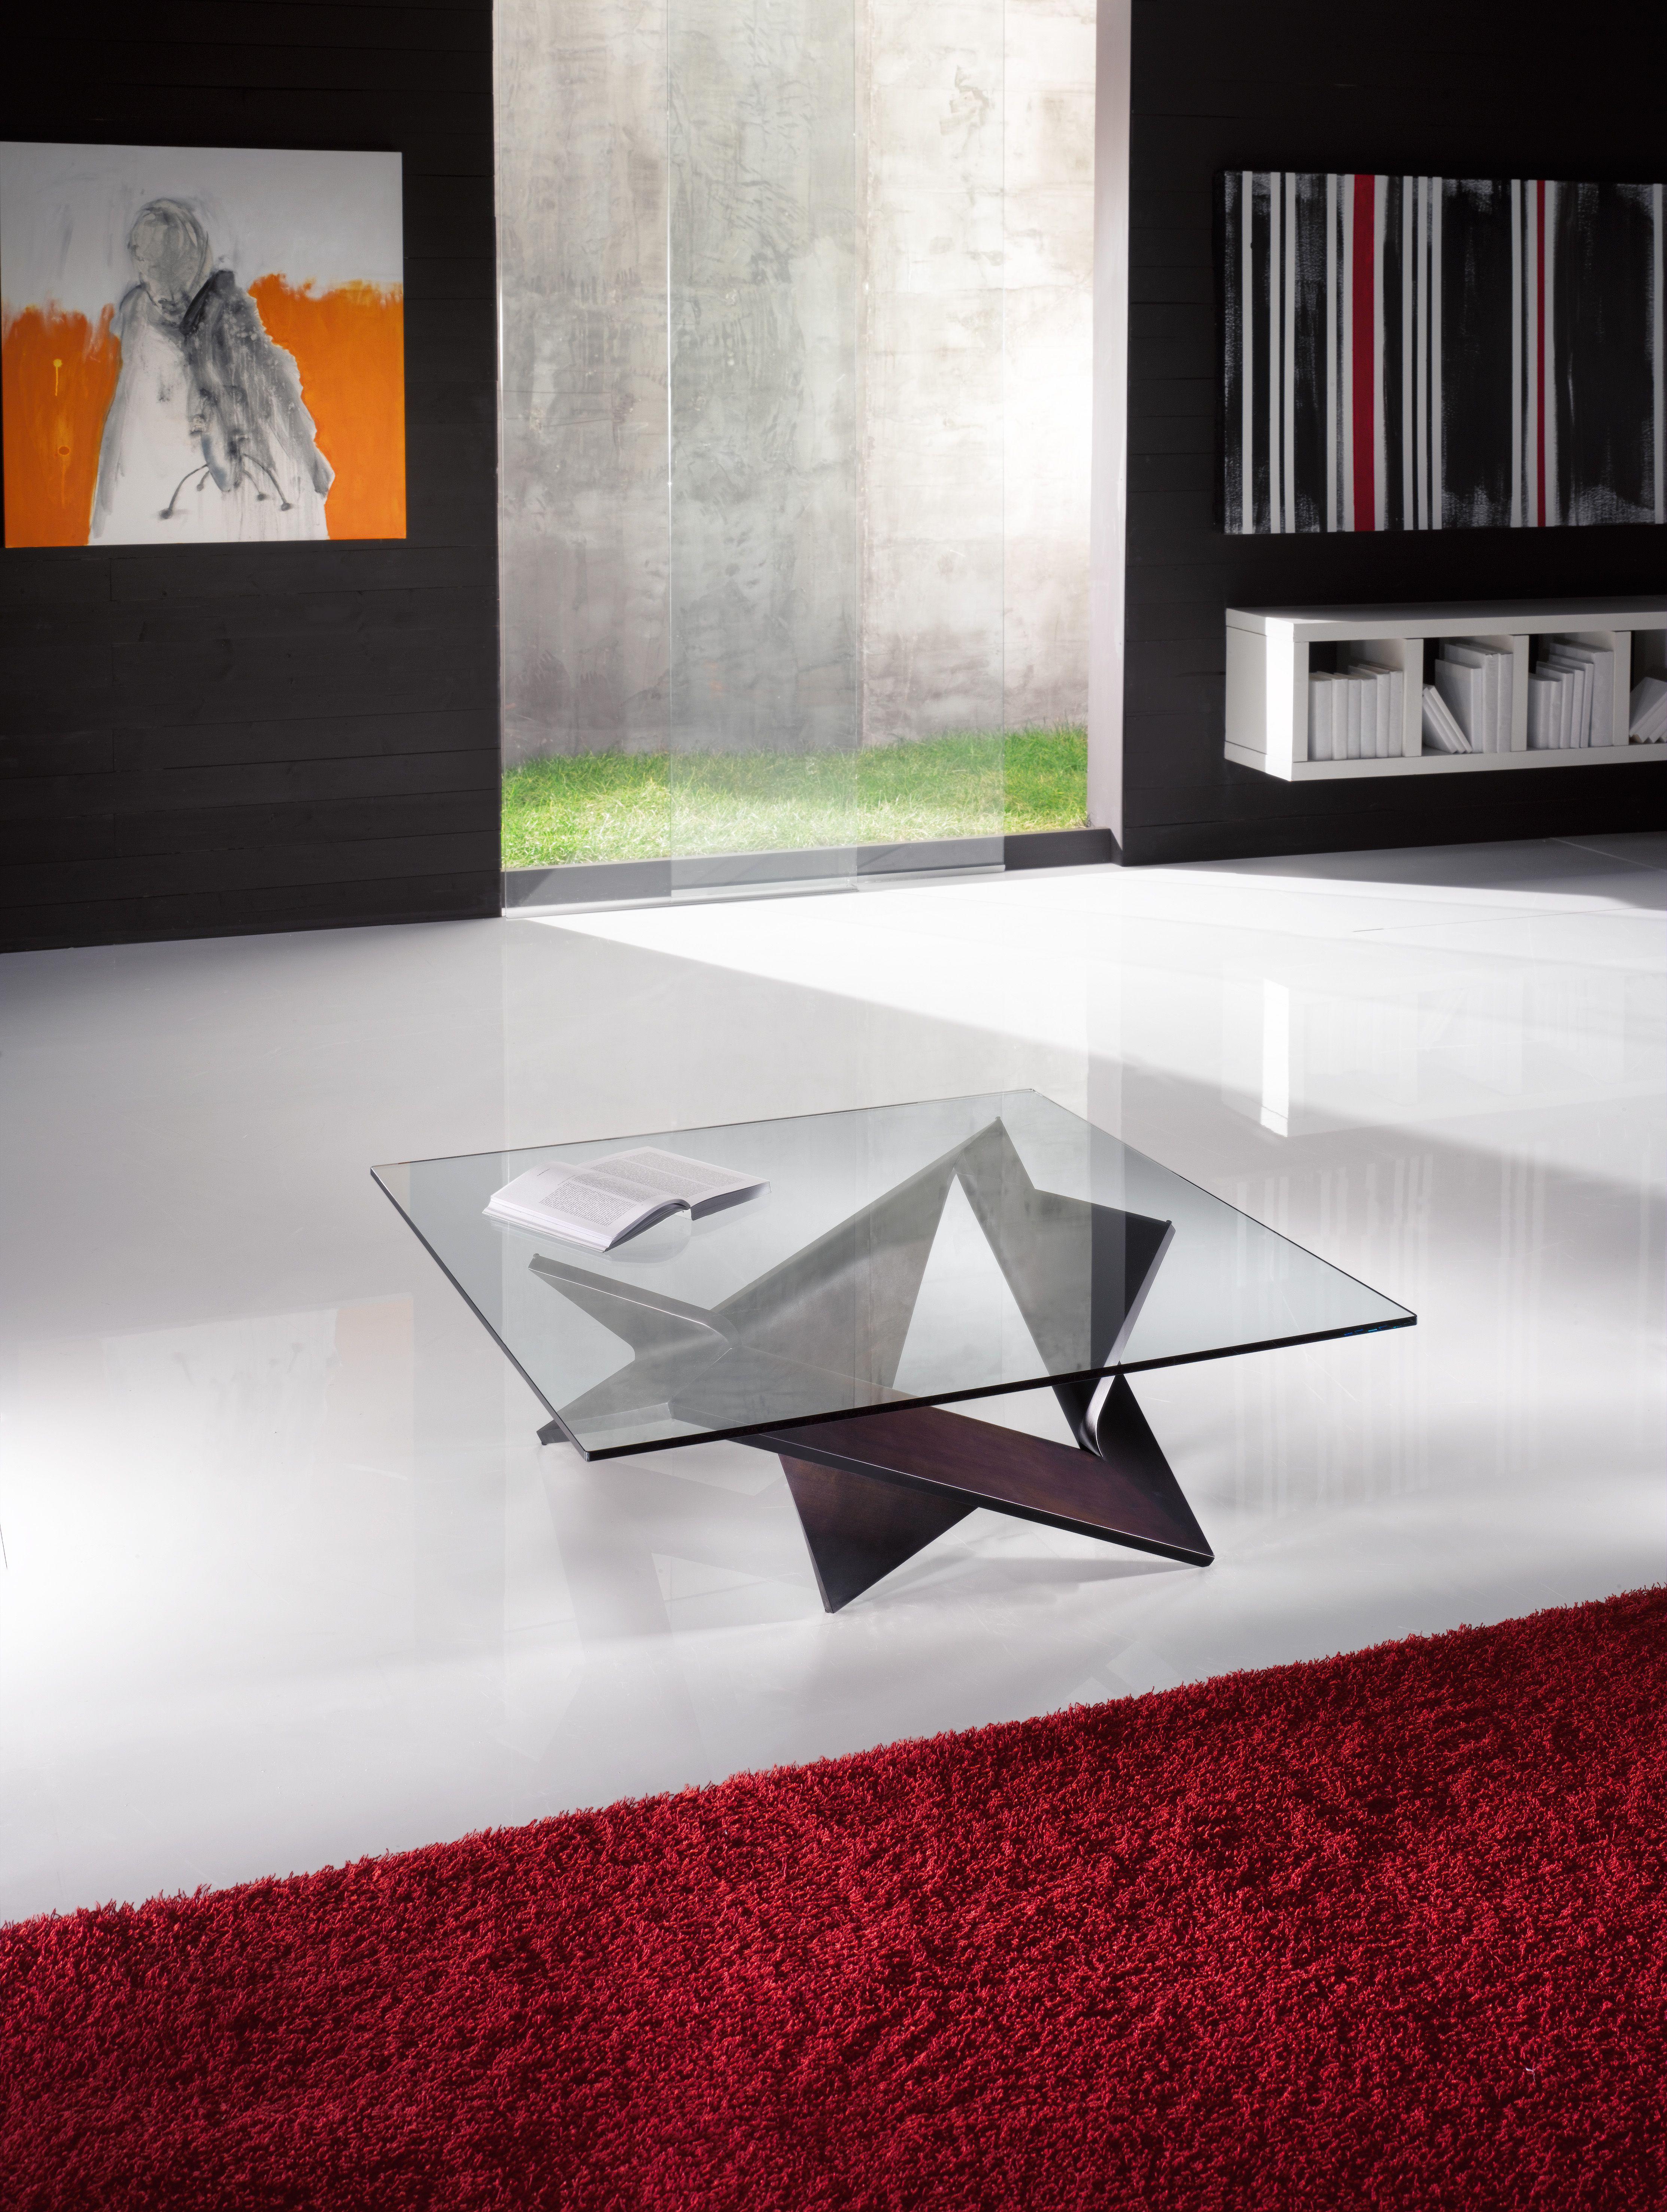 Mathematique Modern Coffee Table At Spazio Di Casa Luxury Living Room Coffee Table Home Decor [ 5906 x 4452 Pixel ]